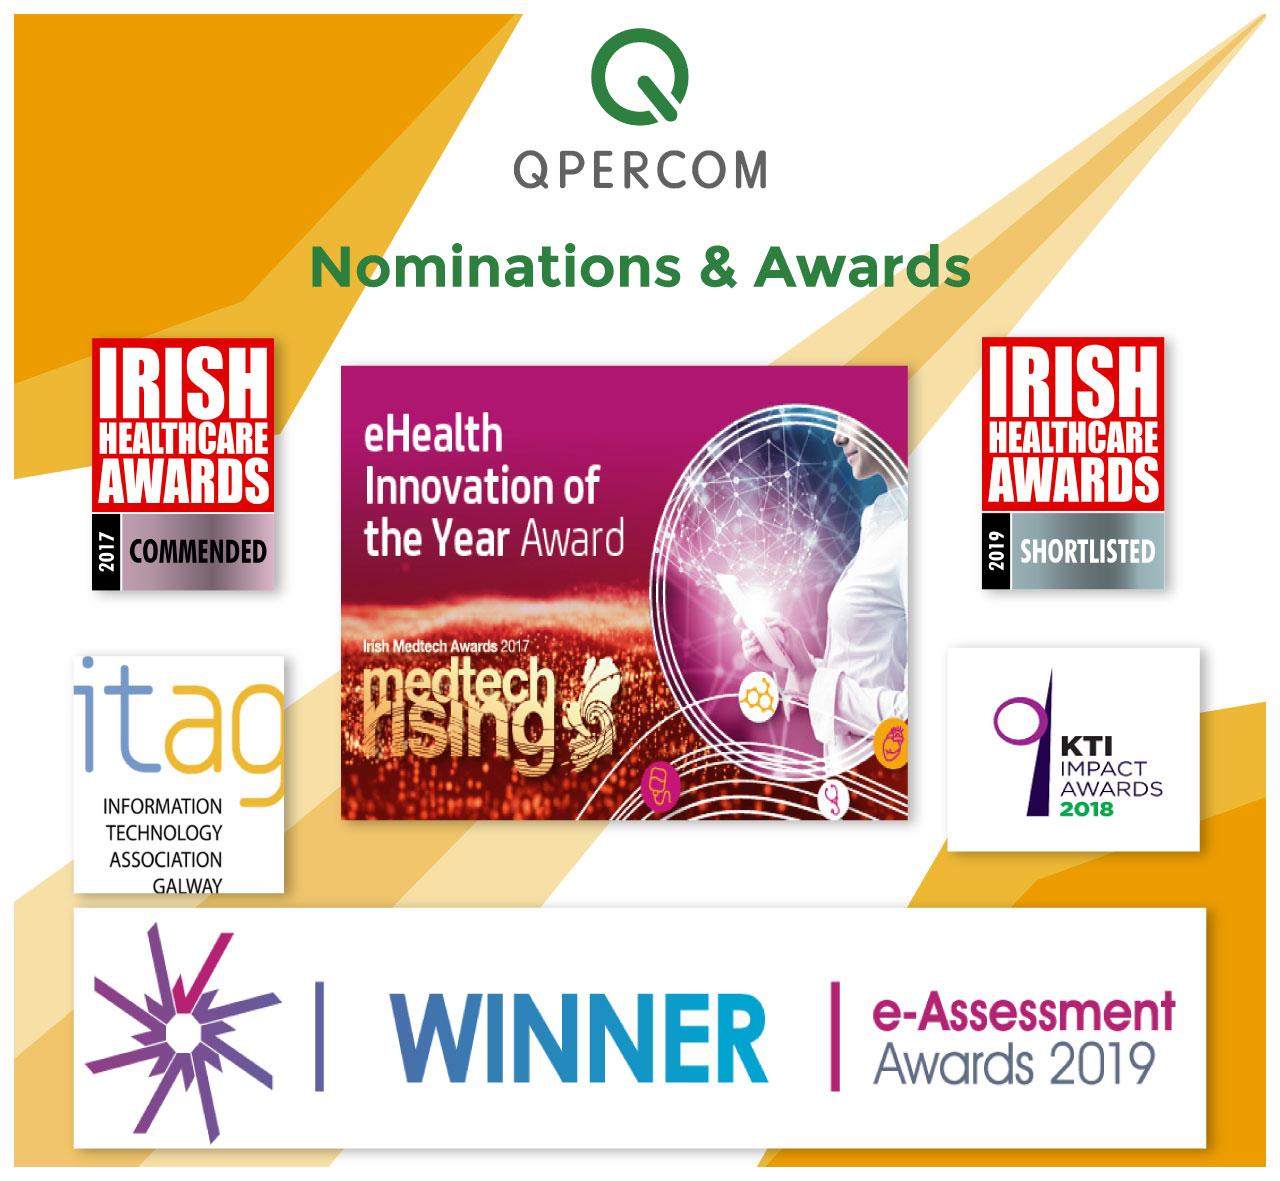 Qpercom Awards